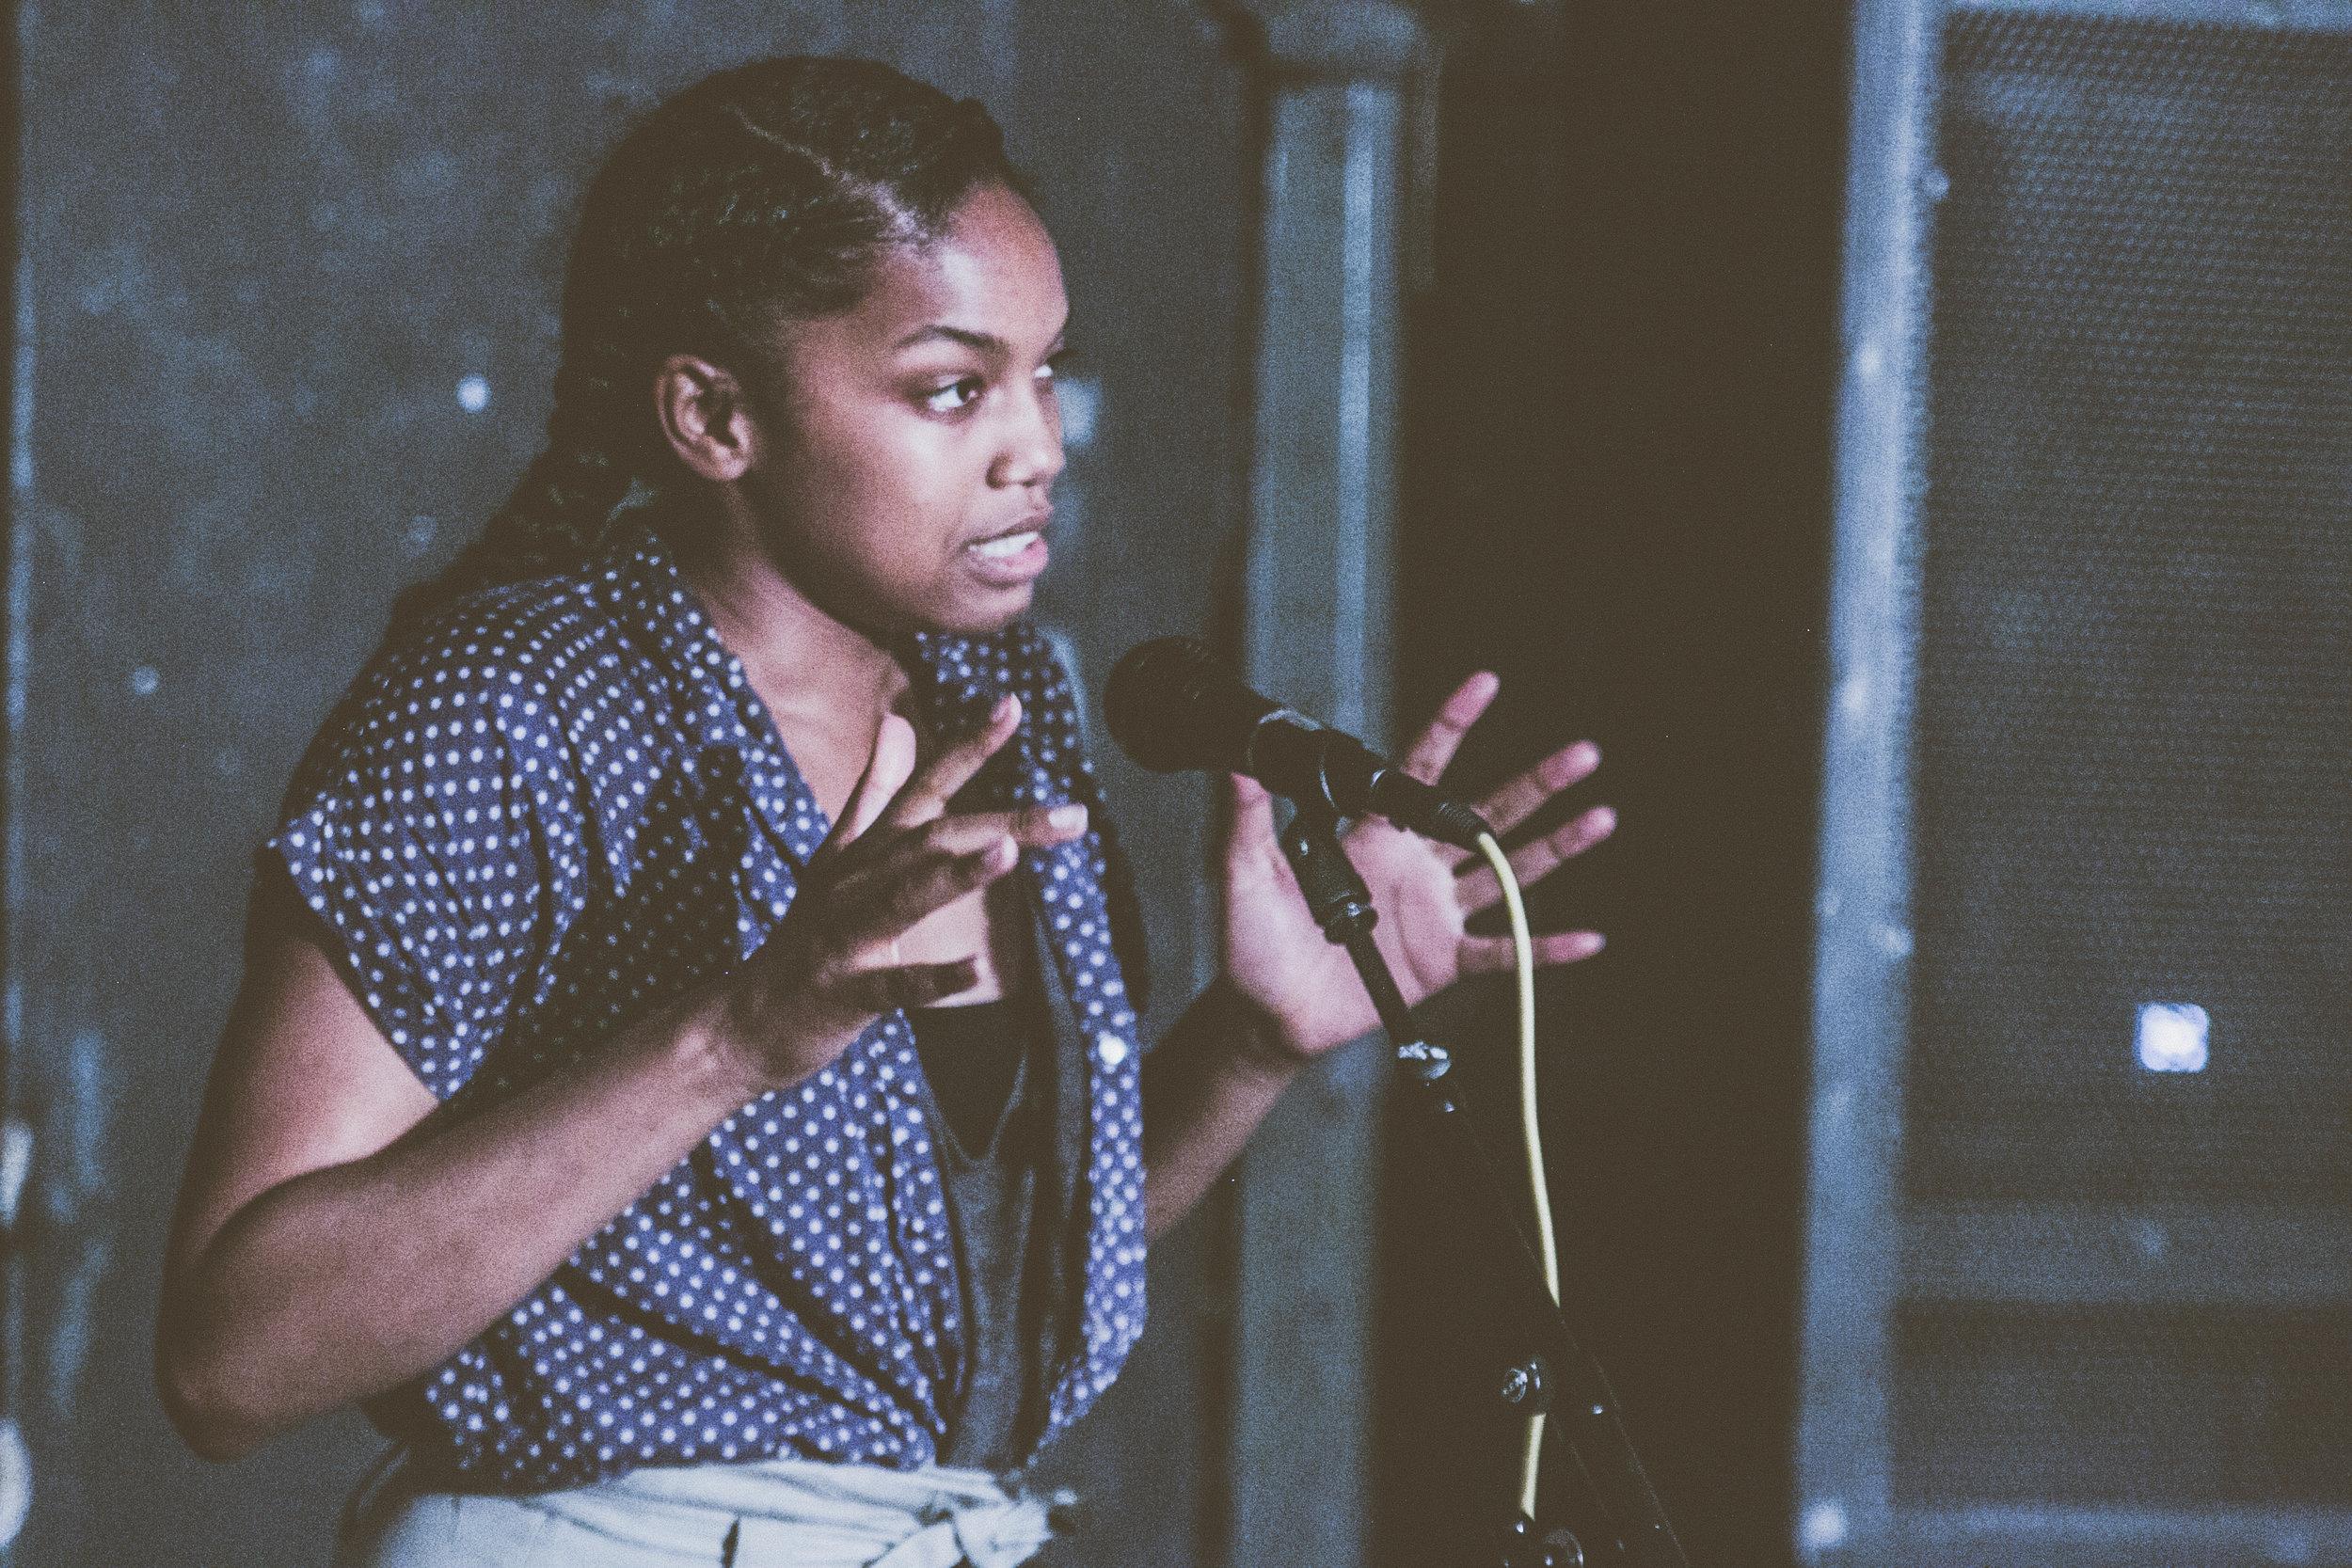 05.07.2017 - Spoken Word London - Dalston - Ant Adams Photo-114.jpg